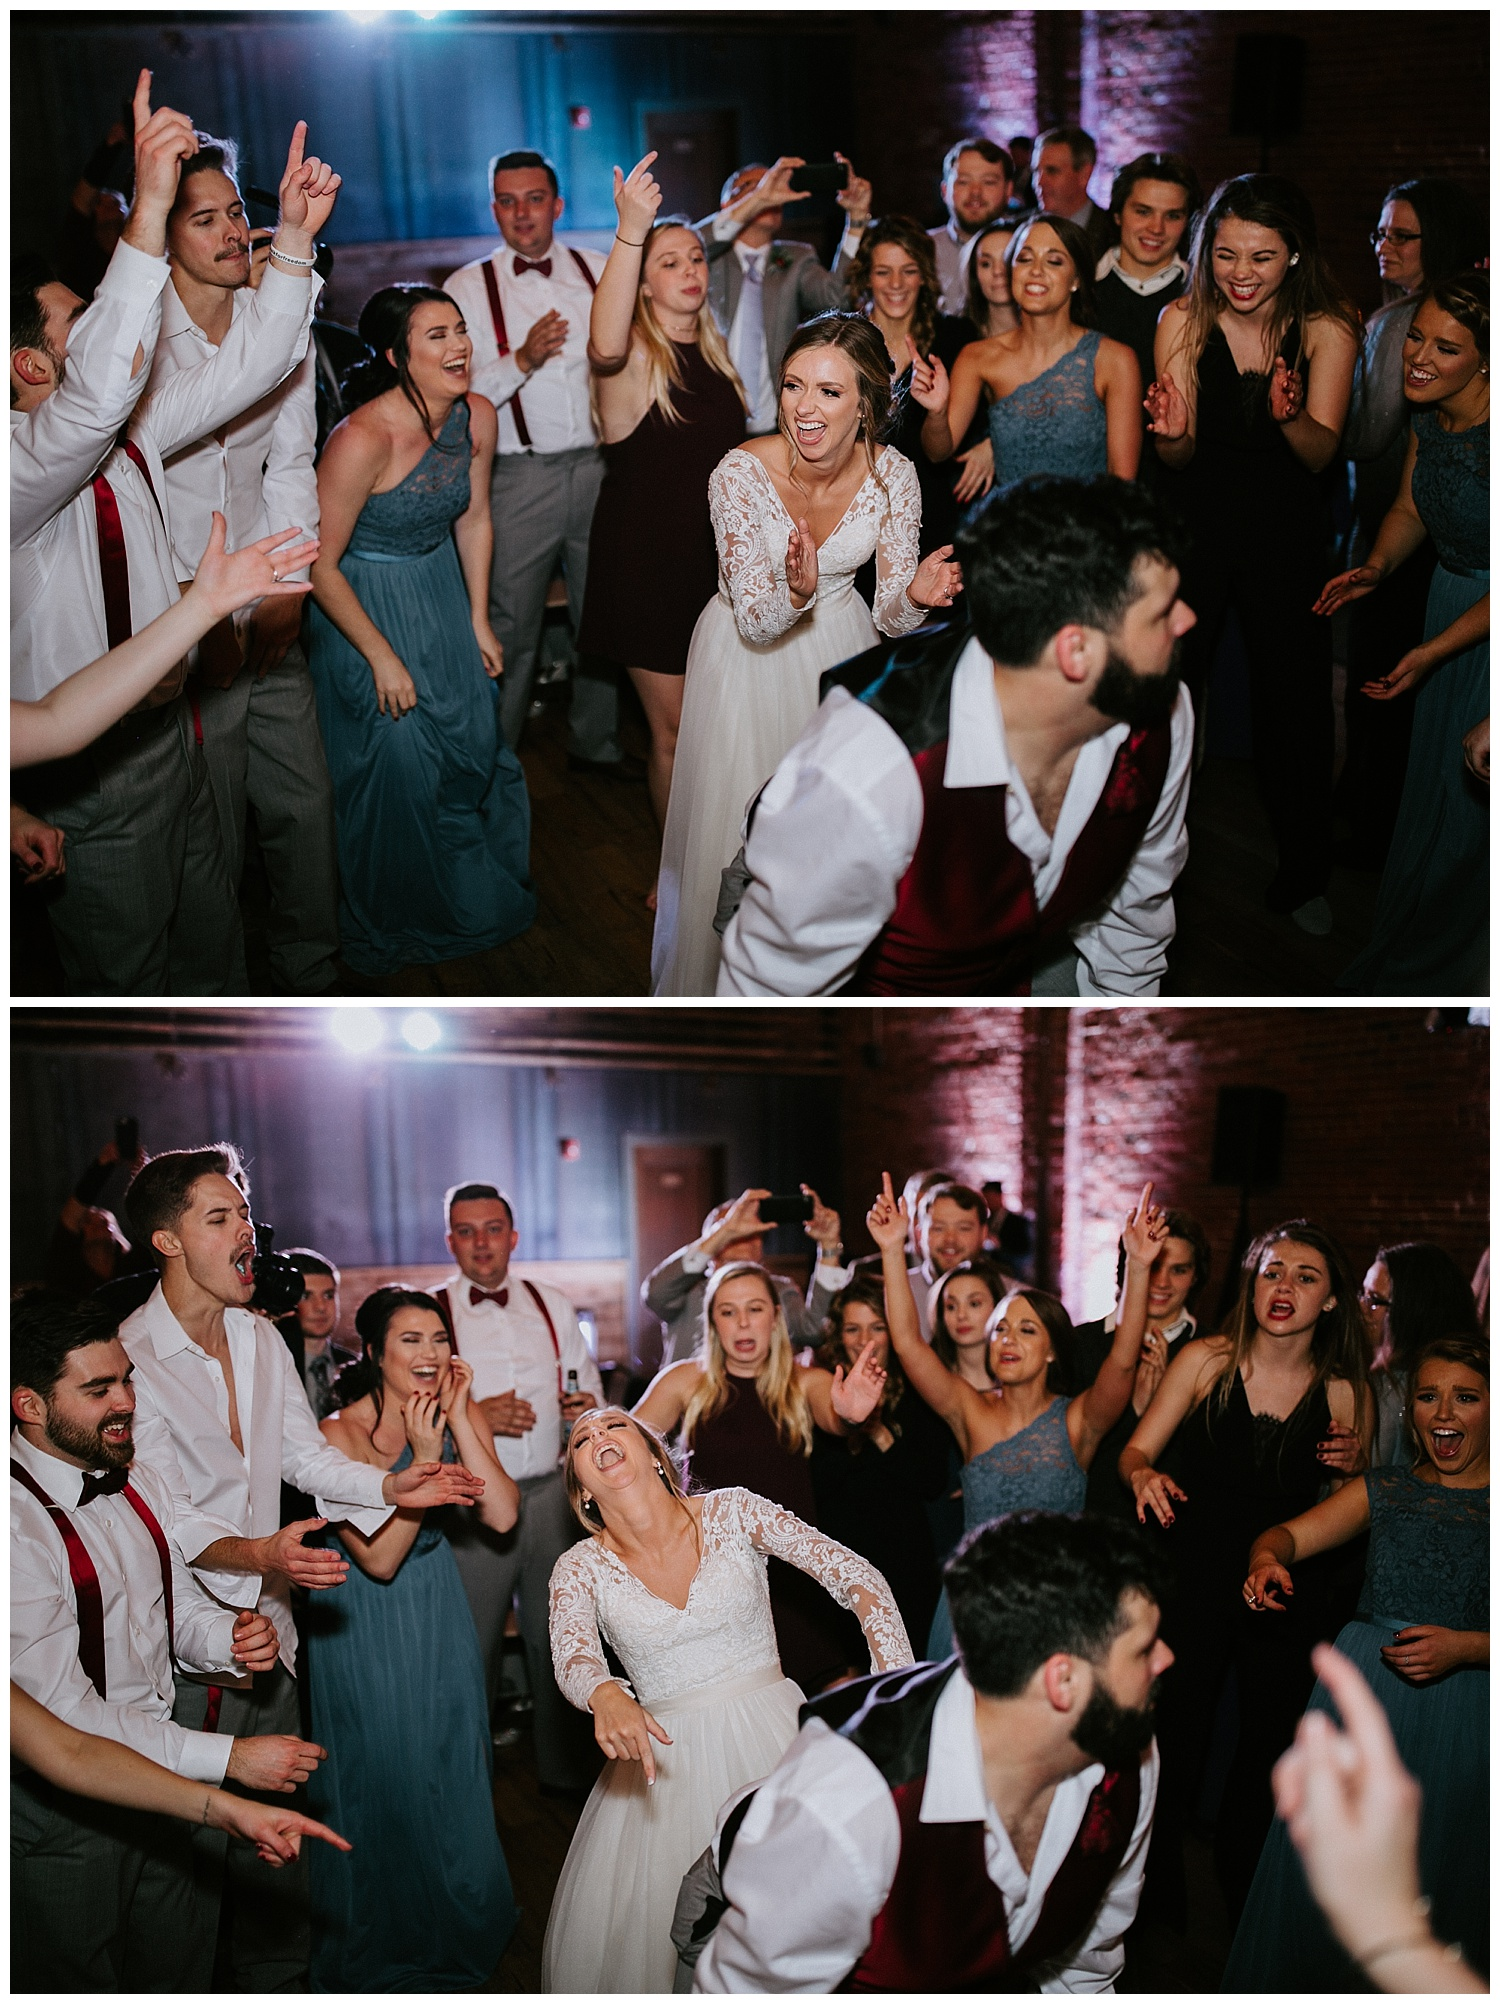 winter-wedding-the standard-knoxville_2019-01-23_0092.jpg